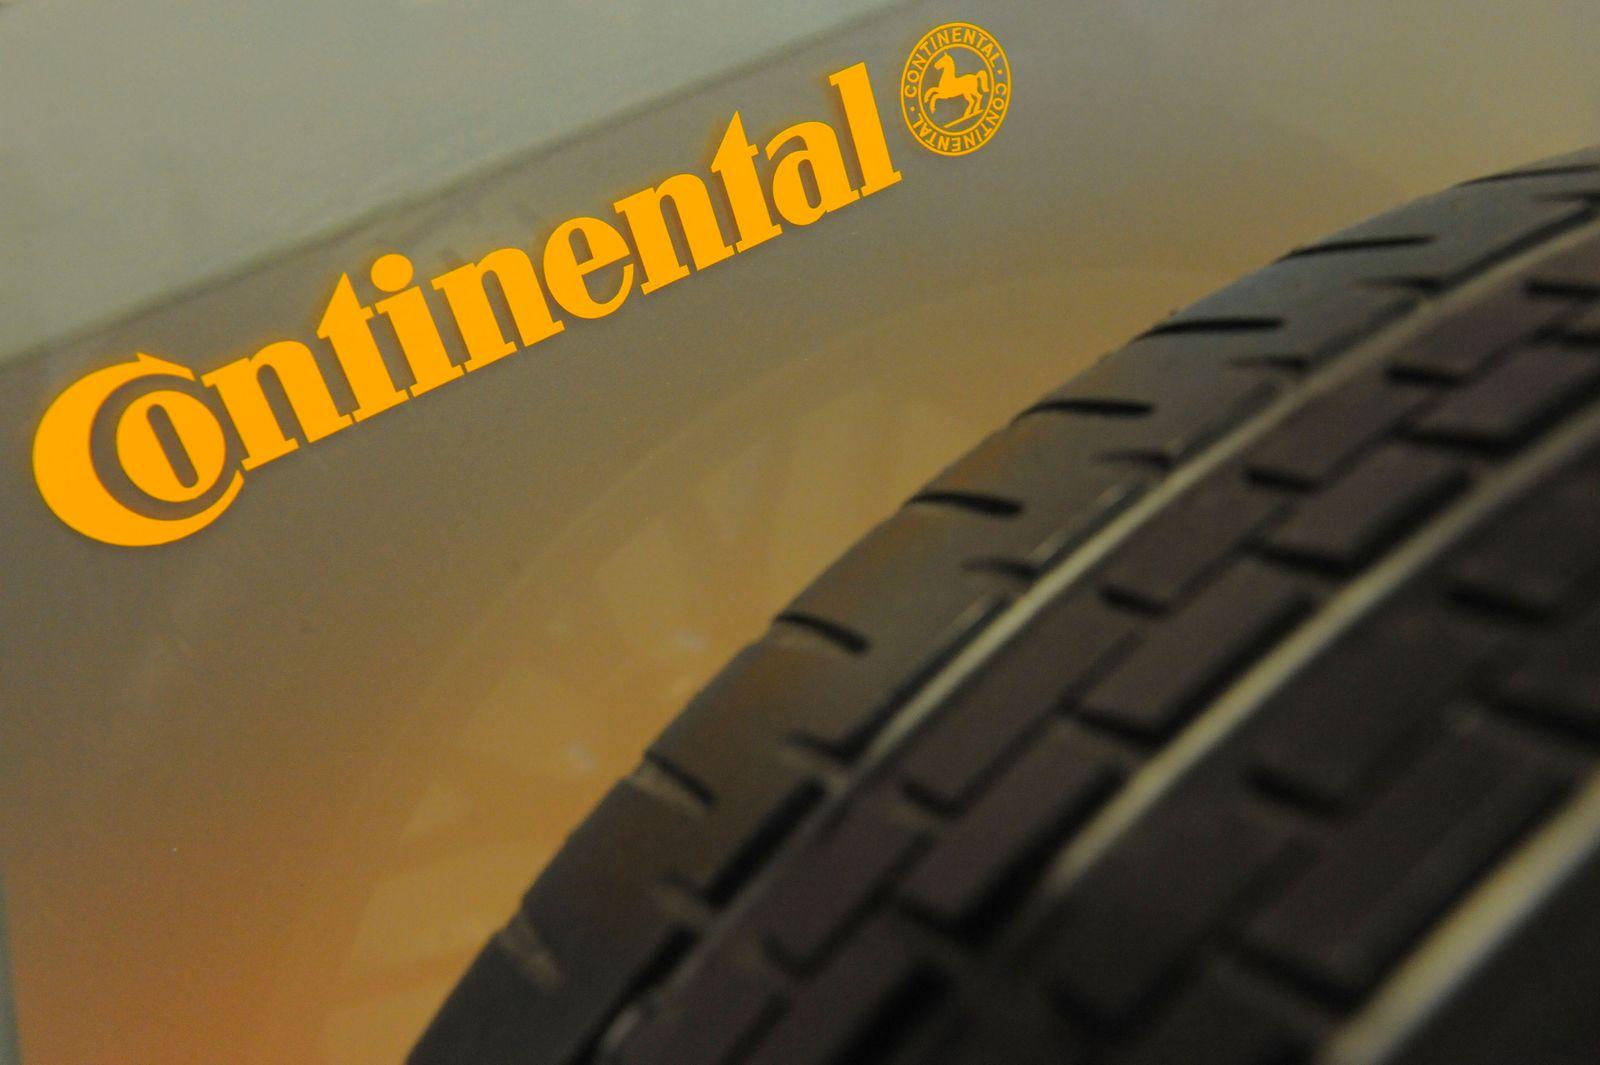 Continental AG / Reifen